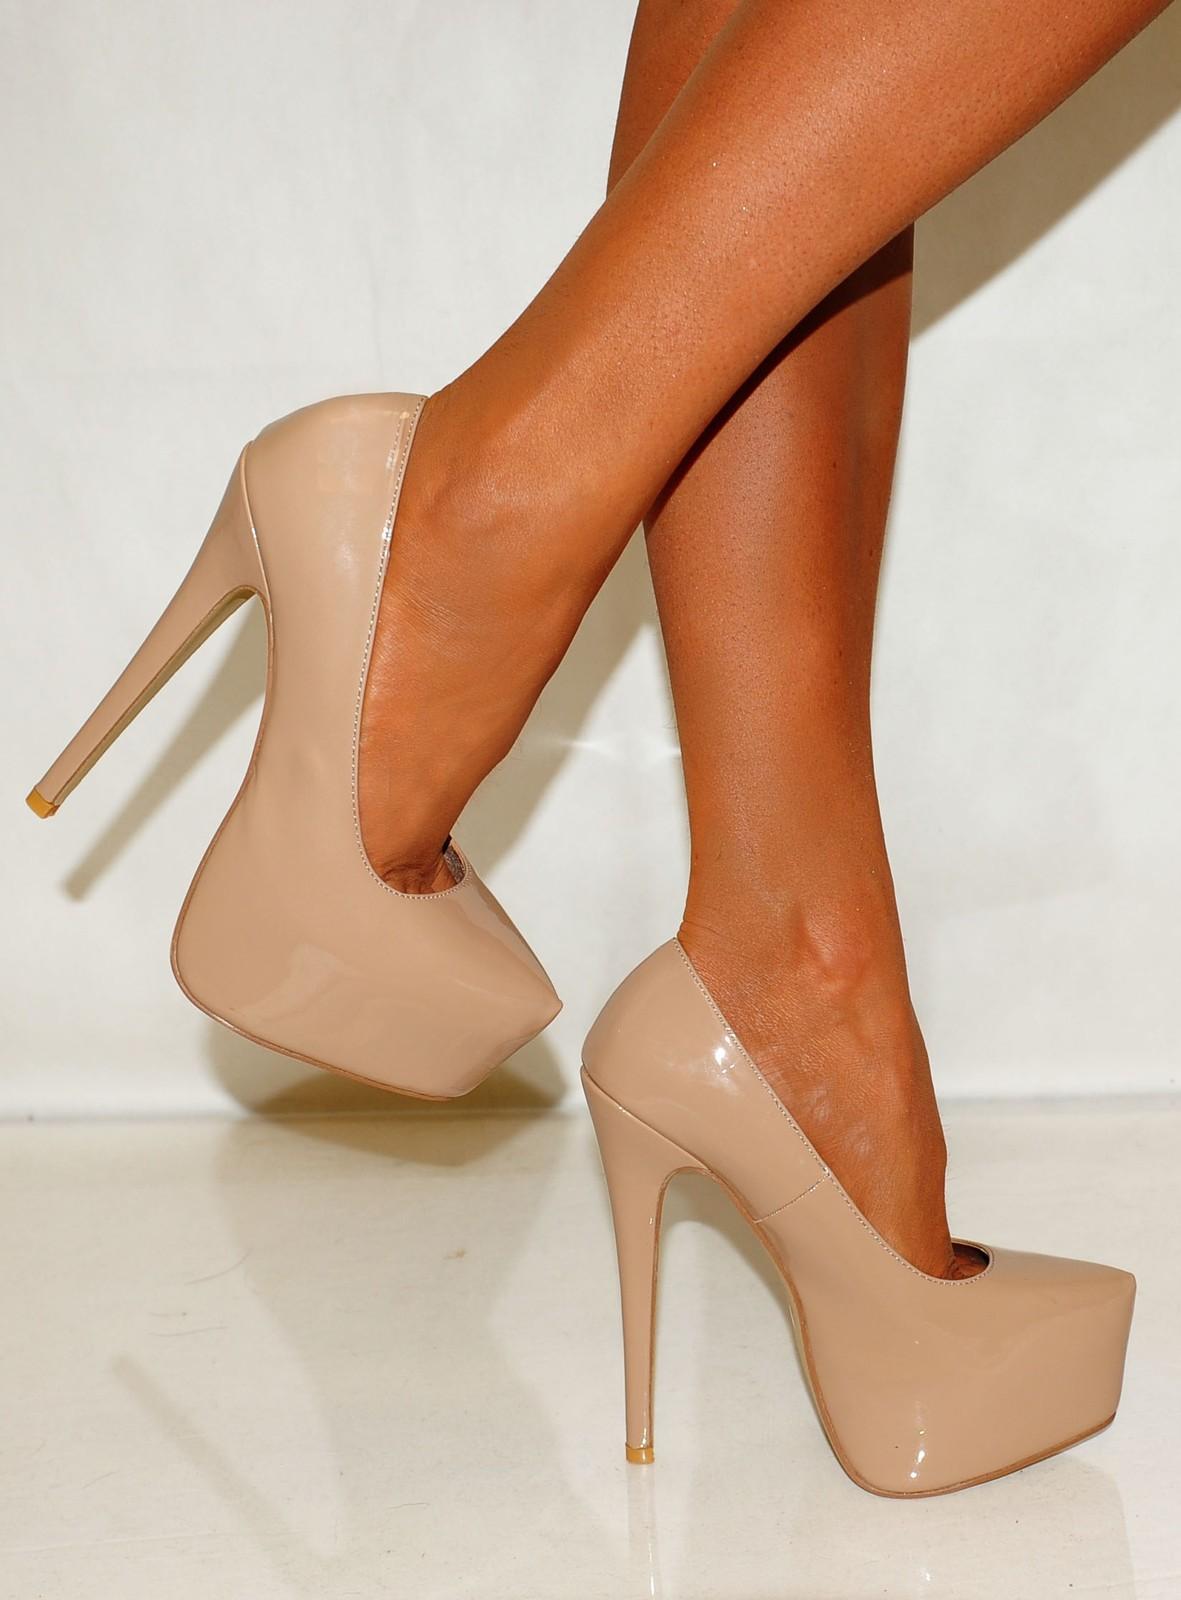 Туфли бежевого цвета фото